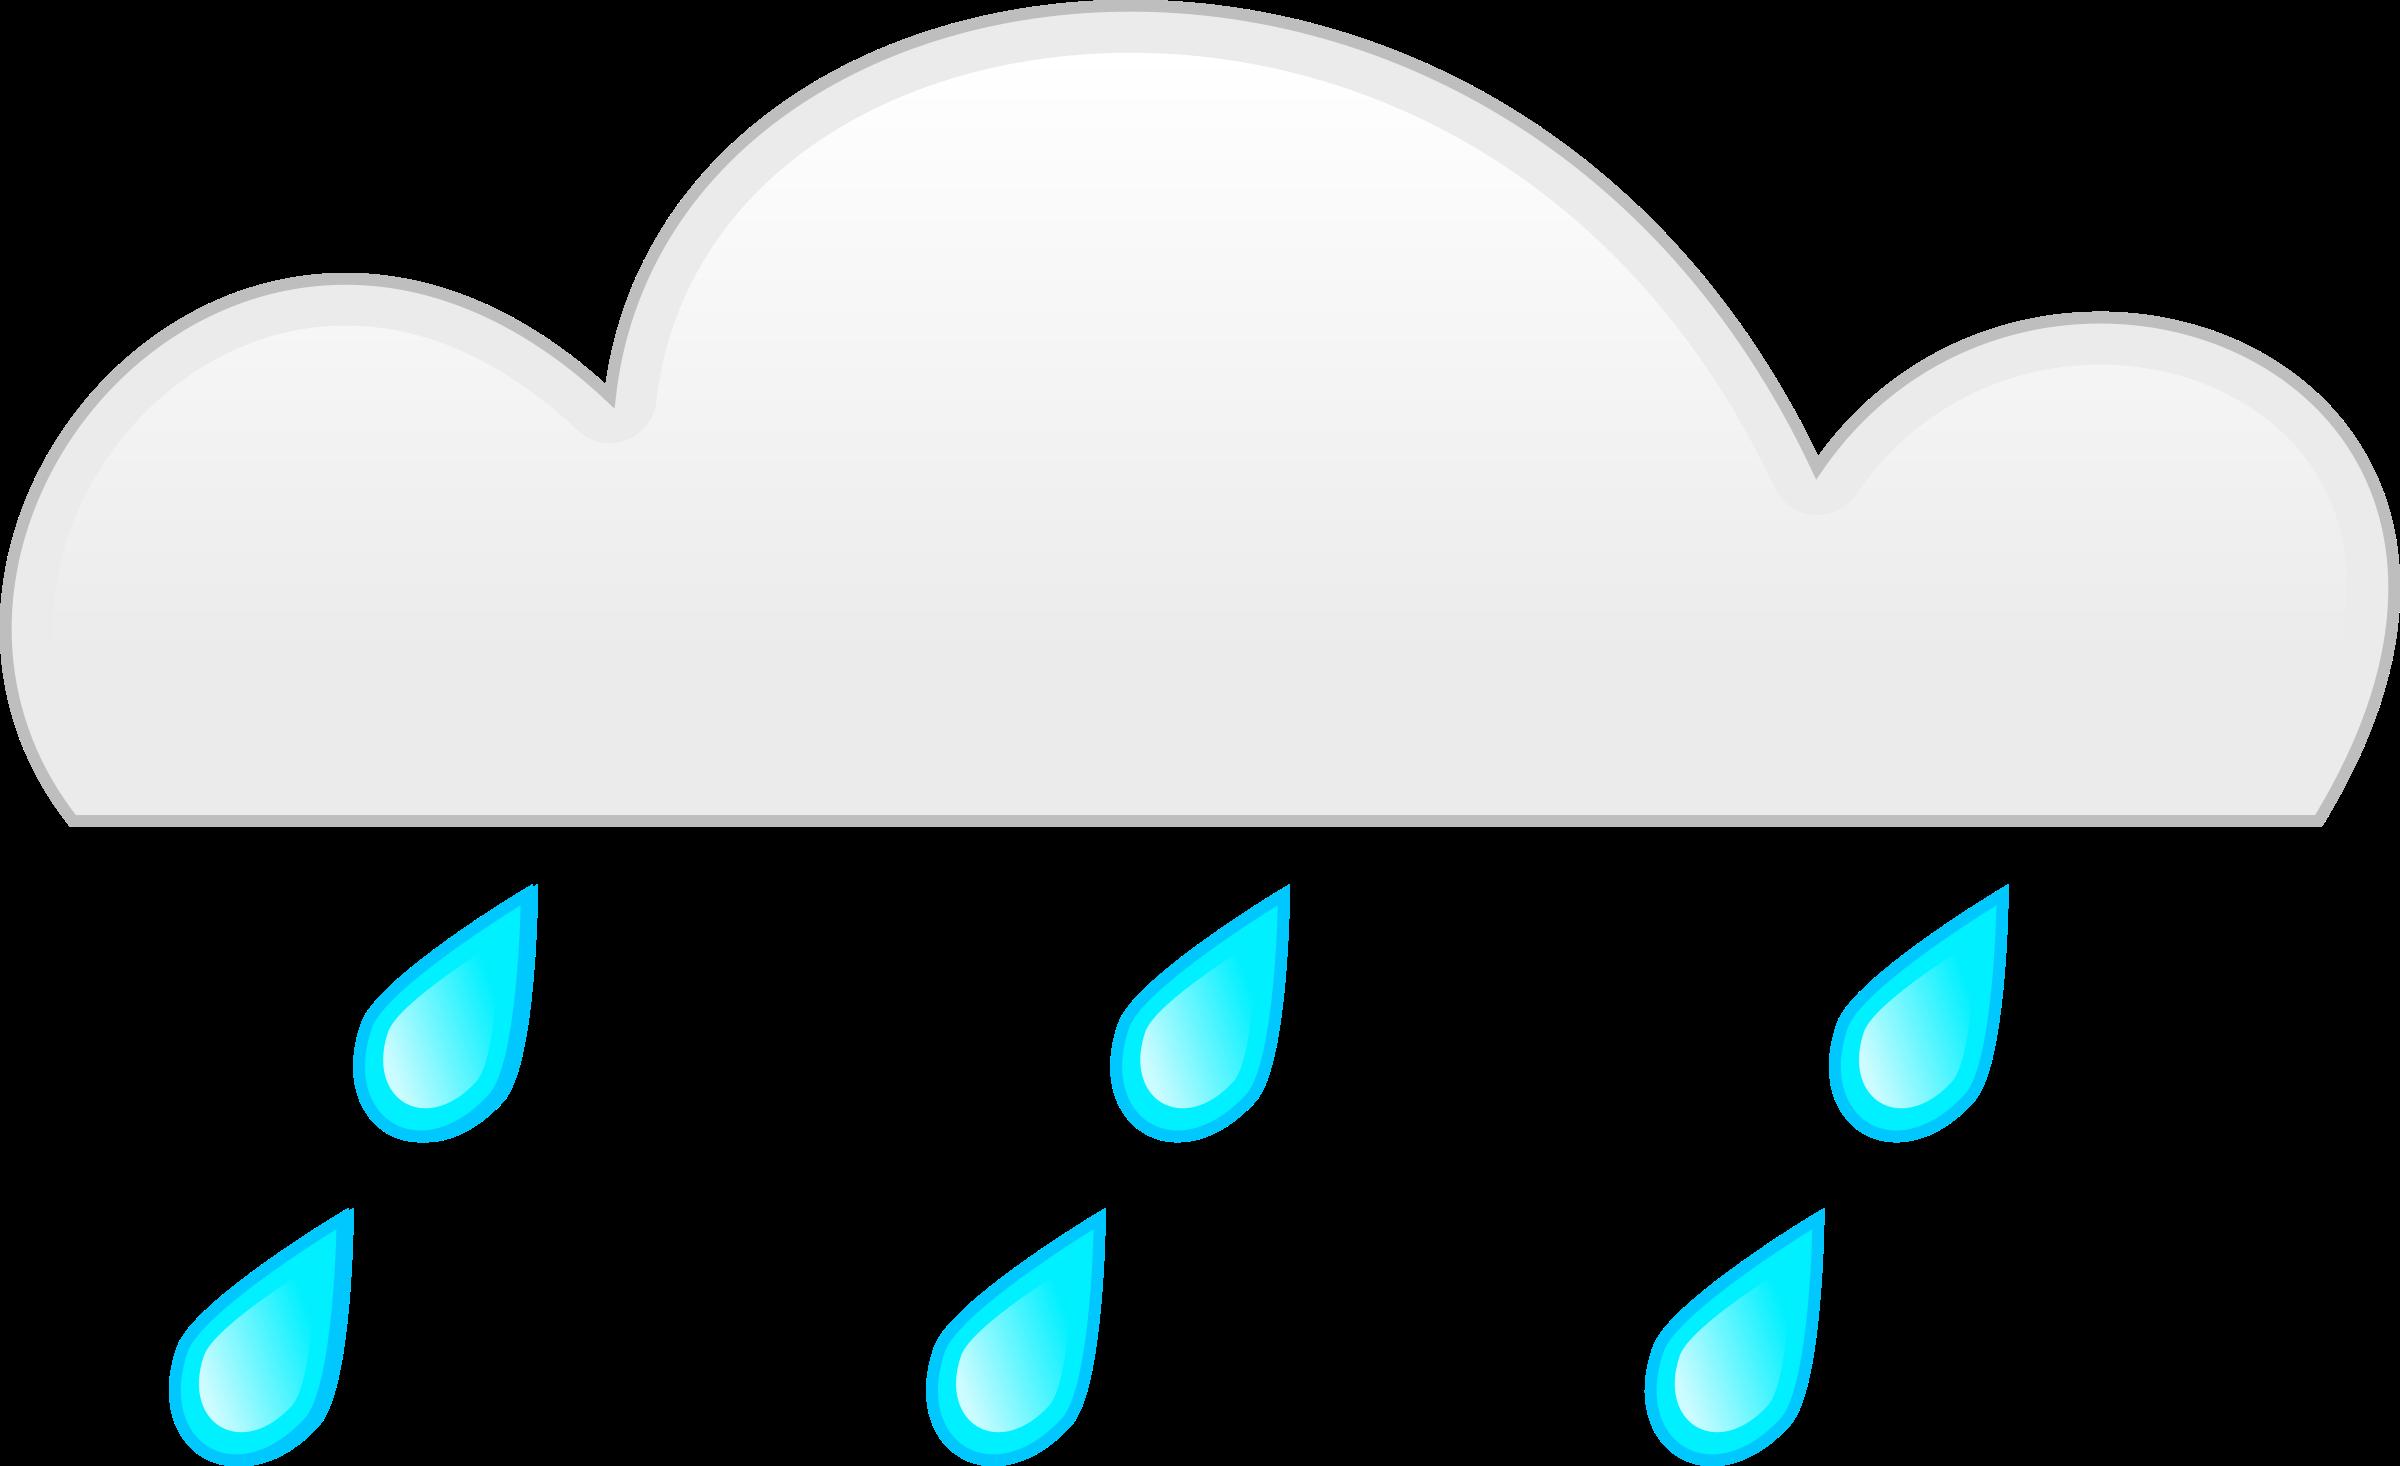 Big image png. Clipart rain rainfall